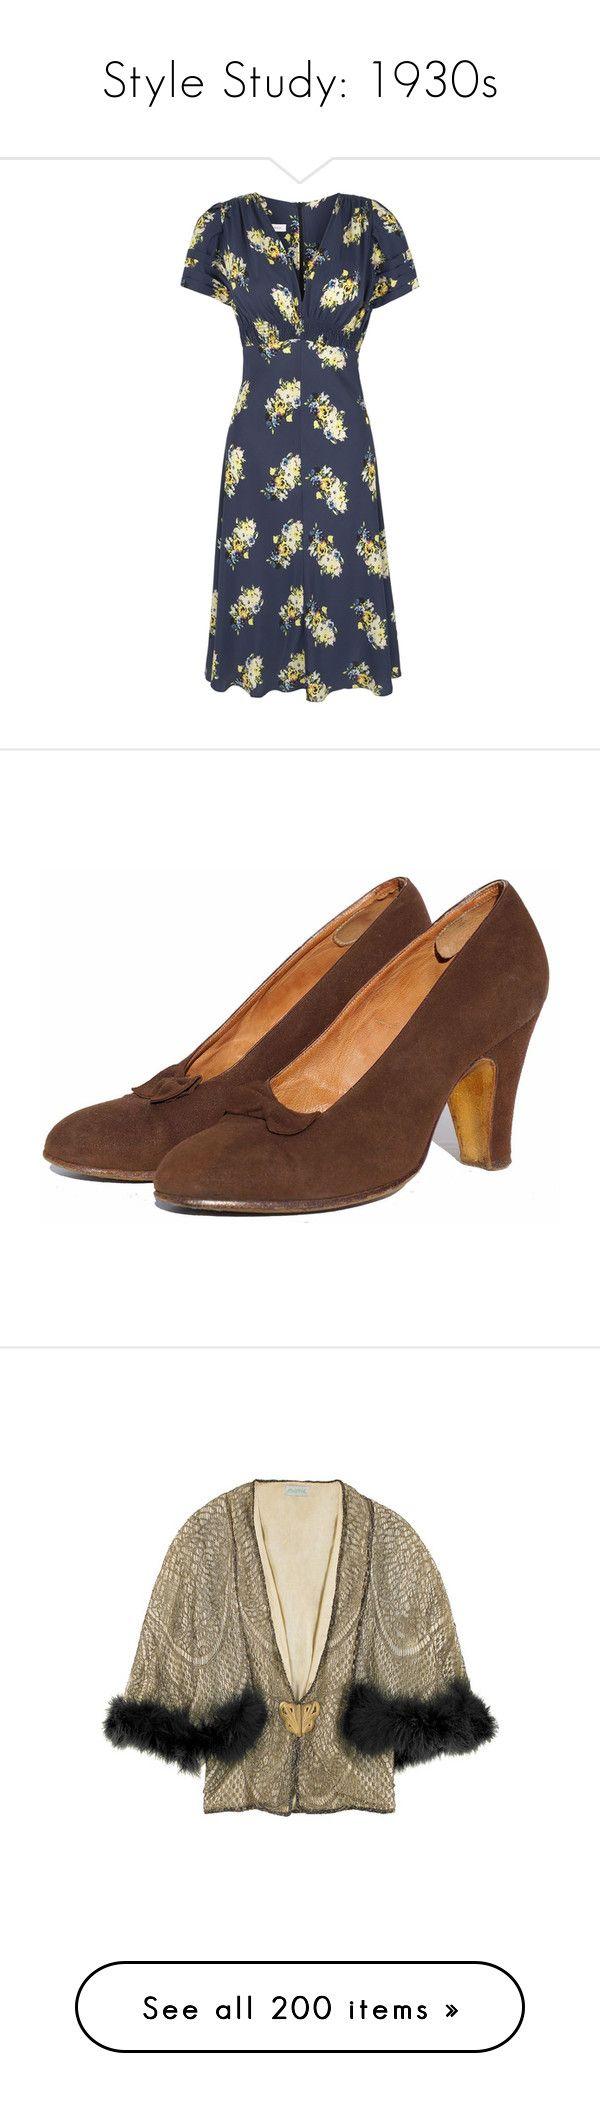 """Style Study: 1930s"" by princesstwi ❤ liked on Polyvore featuring dresses, vestido, vintage looking dresses, vintage pattern dress, below knee dresses, urban dresses, tea dress, shoes, pumps and heels"